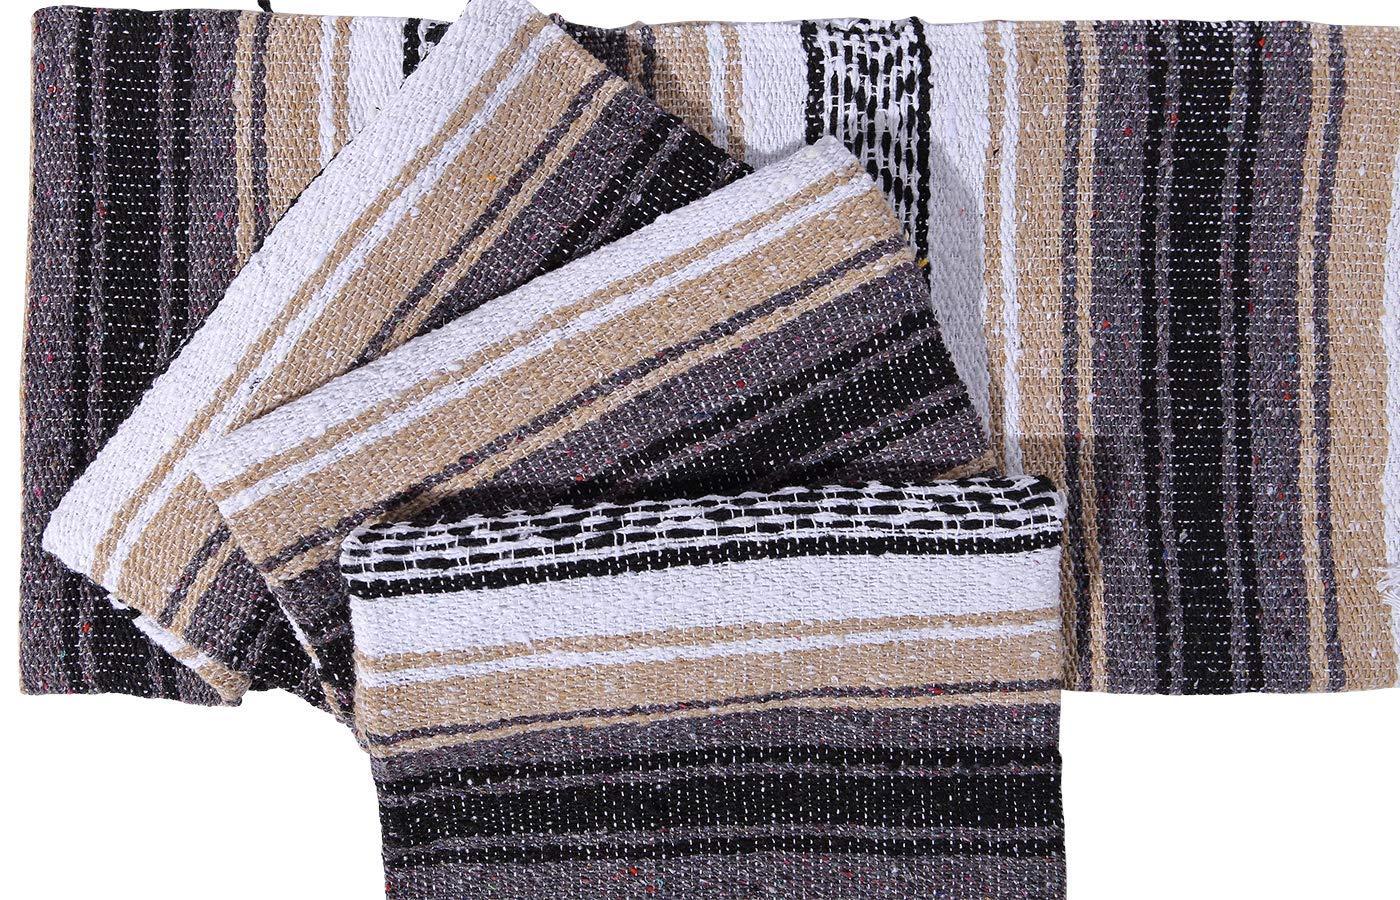 El Paso Designs Genuine Mexican Falsa Blanket - Yoga Studio Blanket, Colorful, Soft Woven Serape Imported from Mexico (Beige) by El Paso Designs (Image #4)